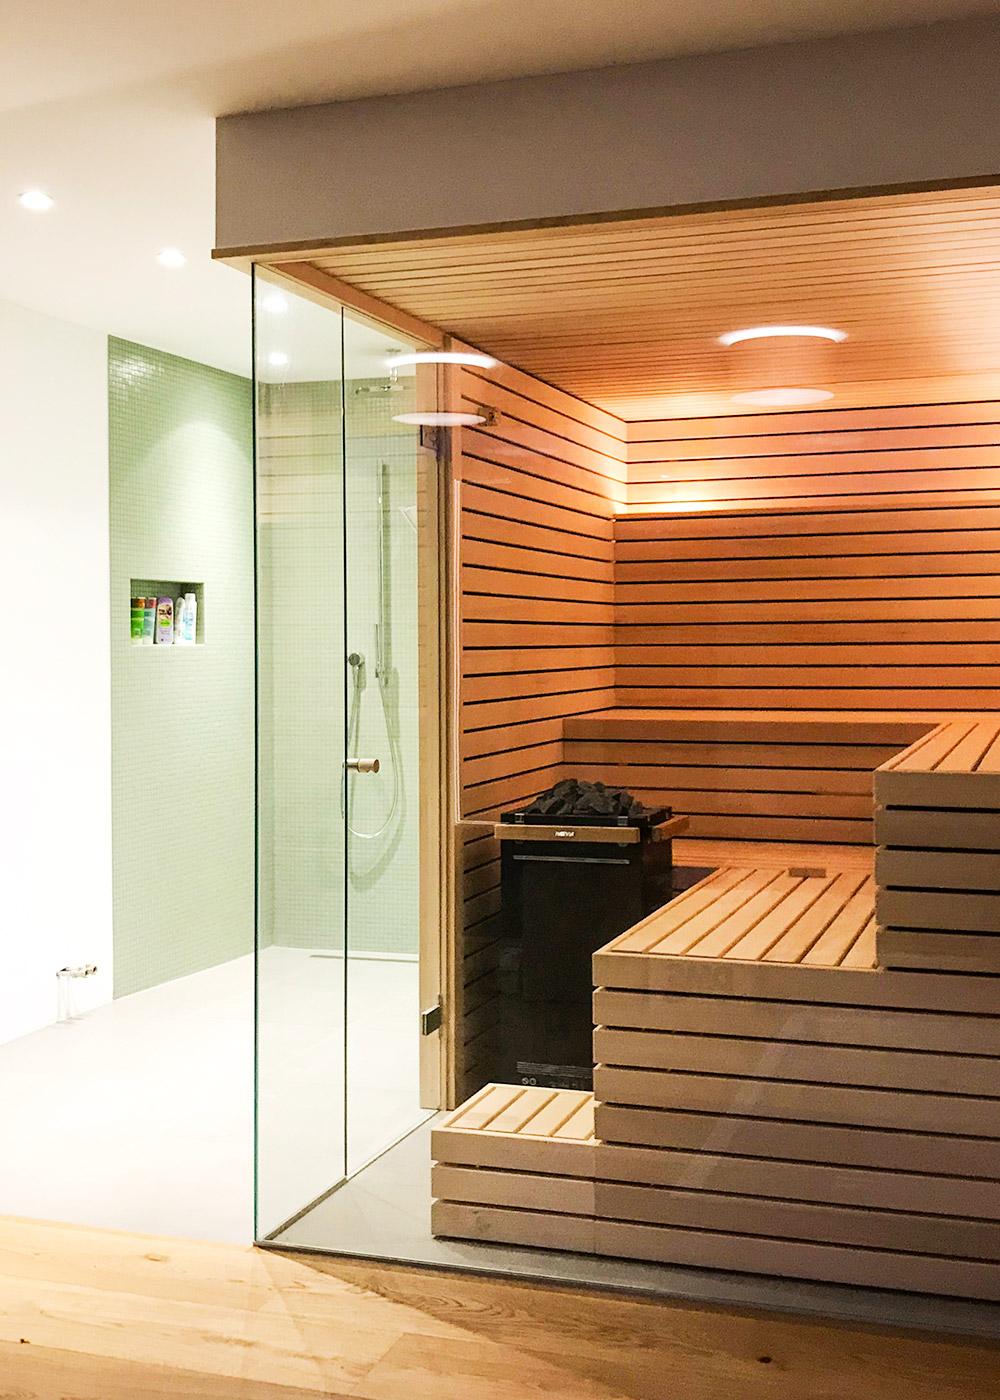 KOERNER Design-Sauna mit Eckverglasung